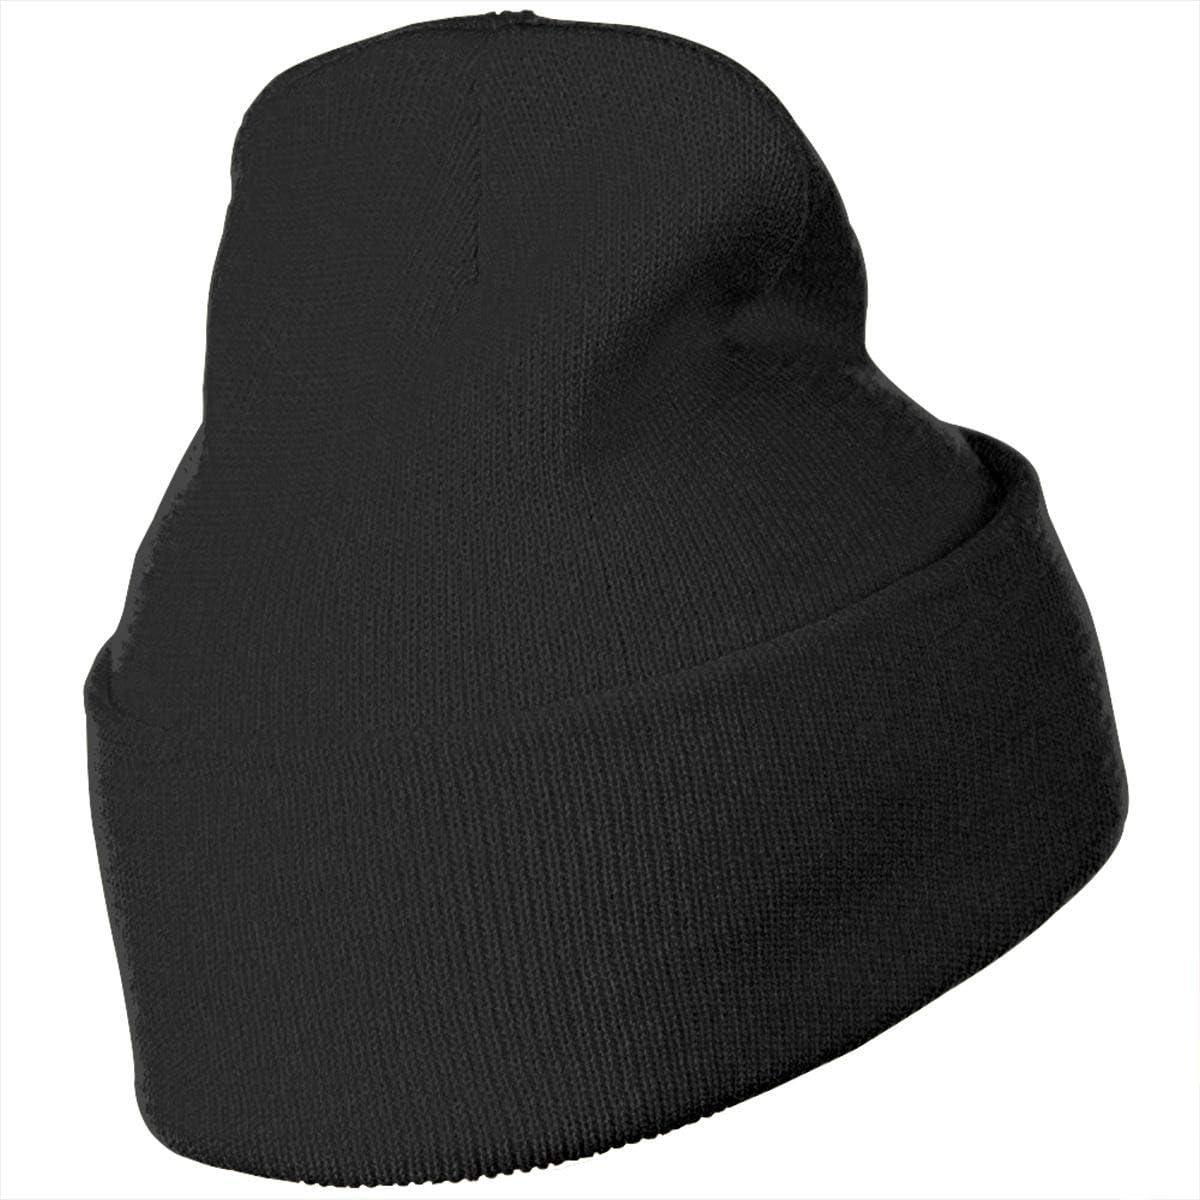 Stretchy /& Soft Winter Ski Skull Cap Belgium Flag LGBT Flag Women Men Solid Color Knit Beanie Hat